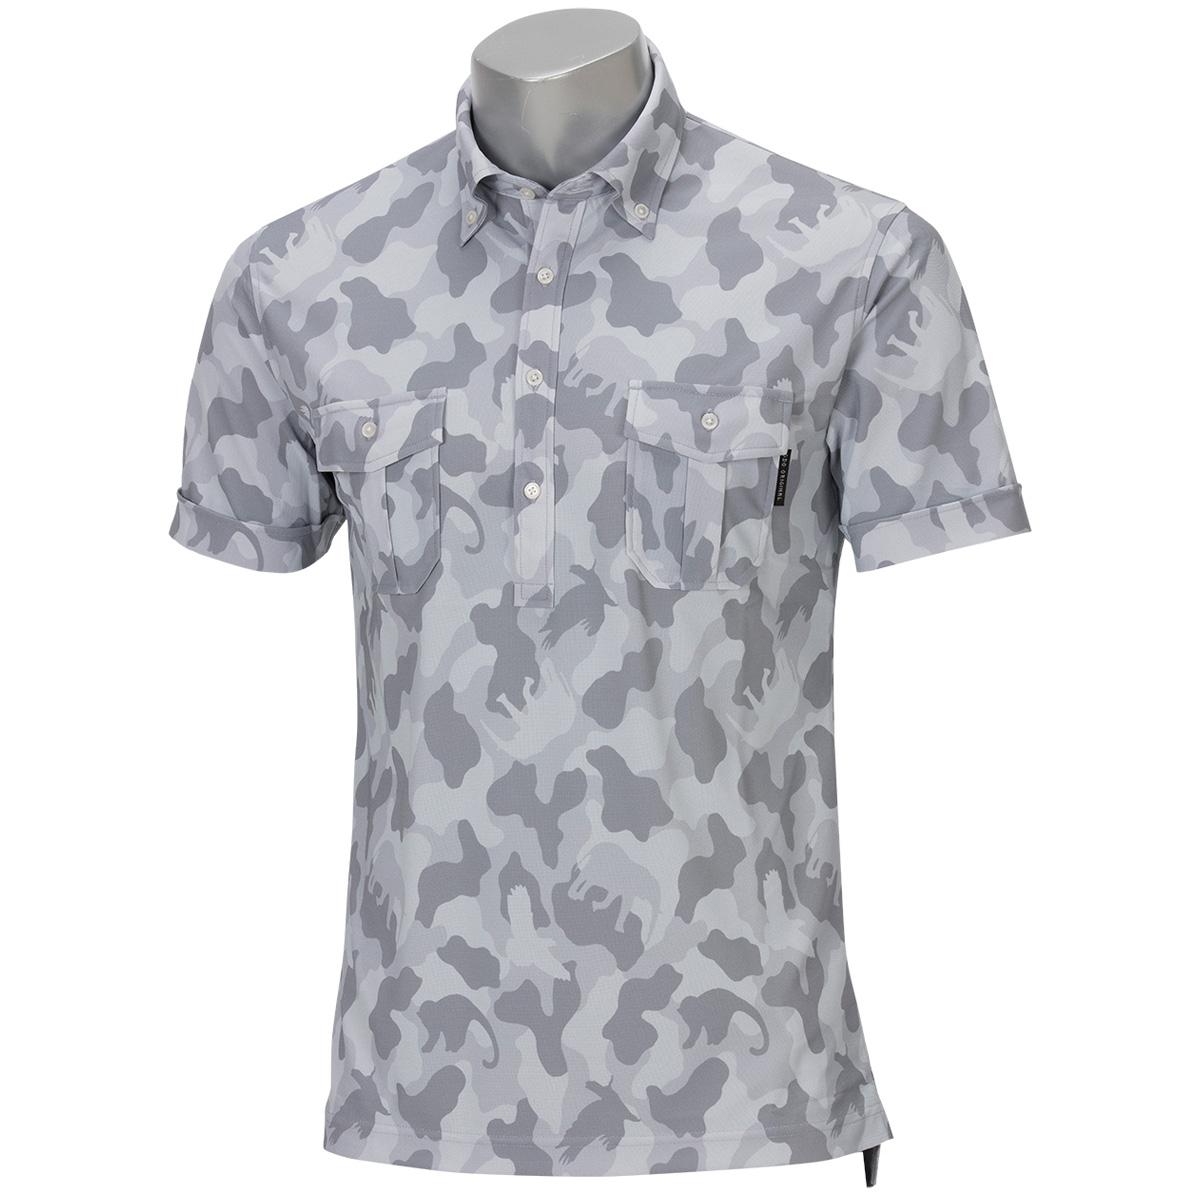 Wポケットボタンダウン半袖ポロシャツ